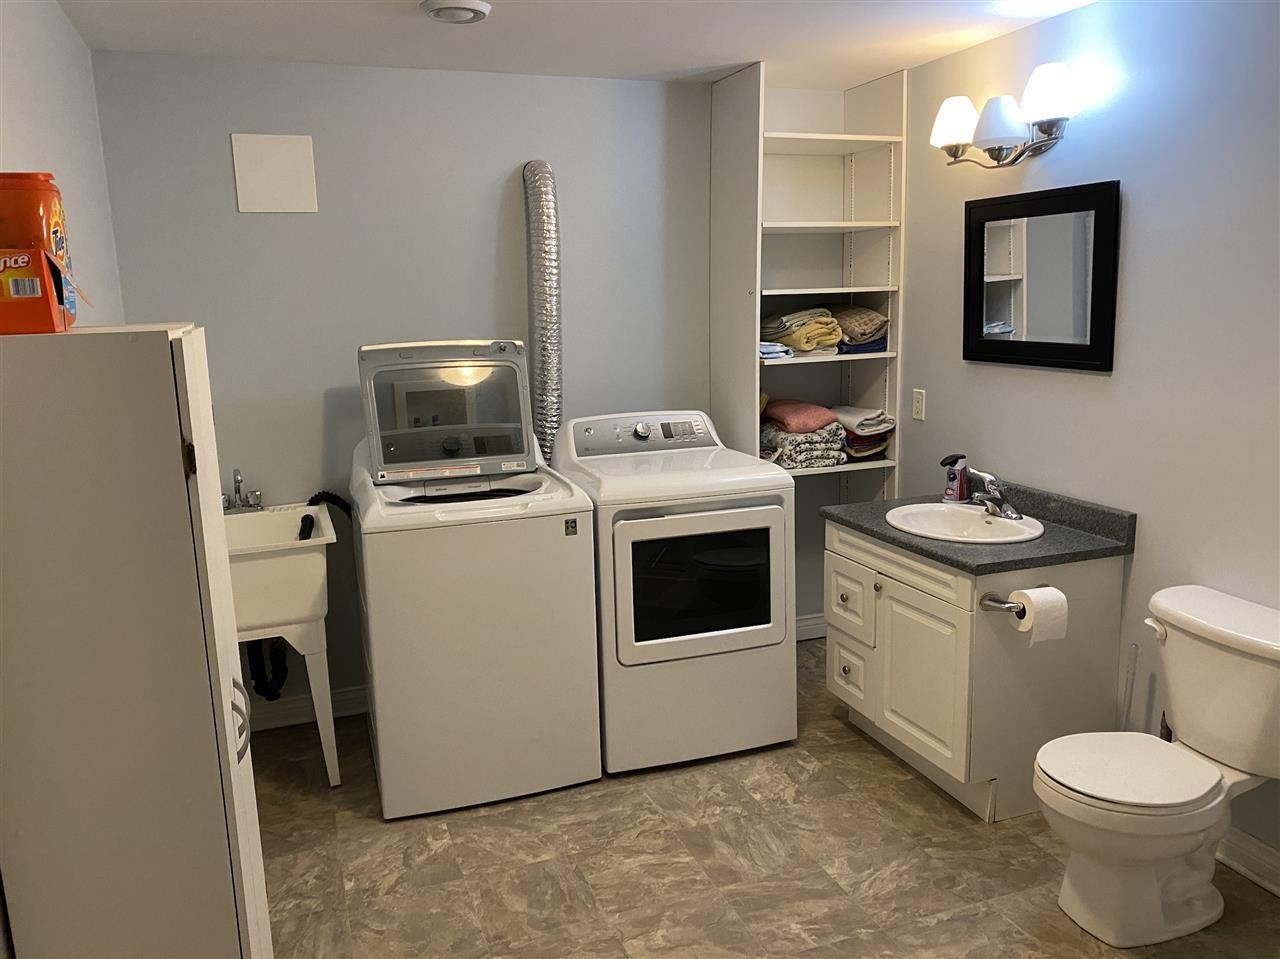 Photo 13: Photos: 7327 Main Street in Louisbourg: 206-Louisbourg Residential for sale (Cape Breton)  : MLS®# 202025505